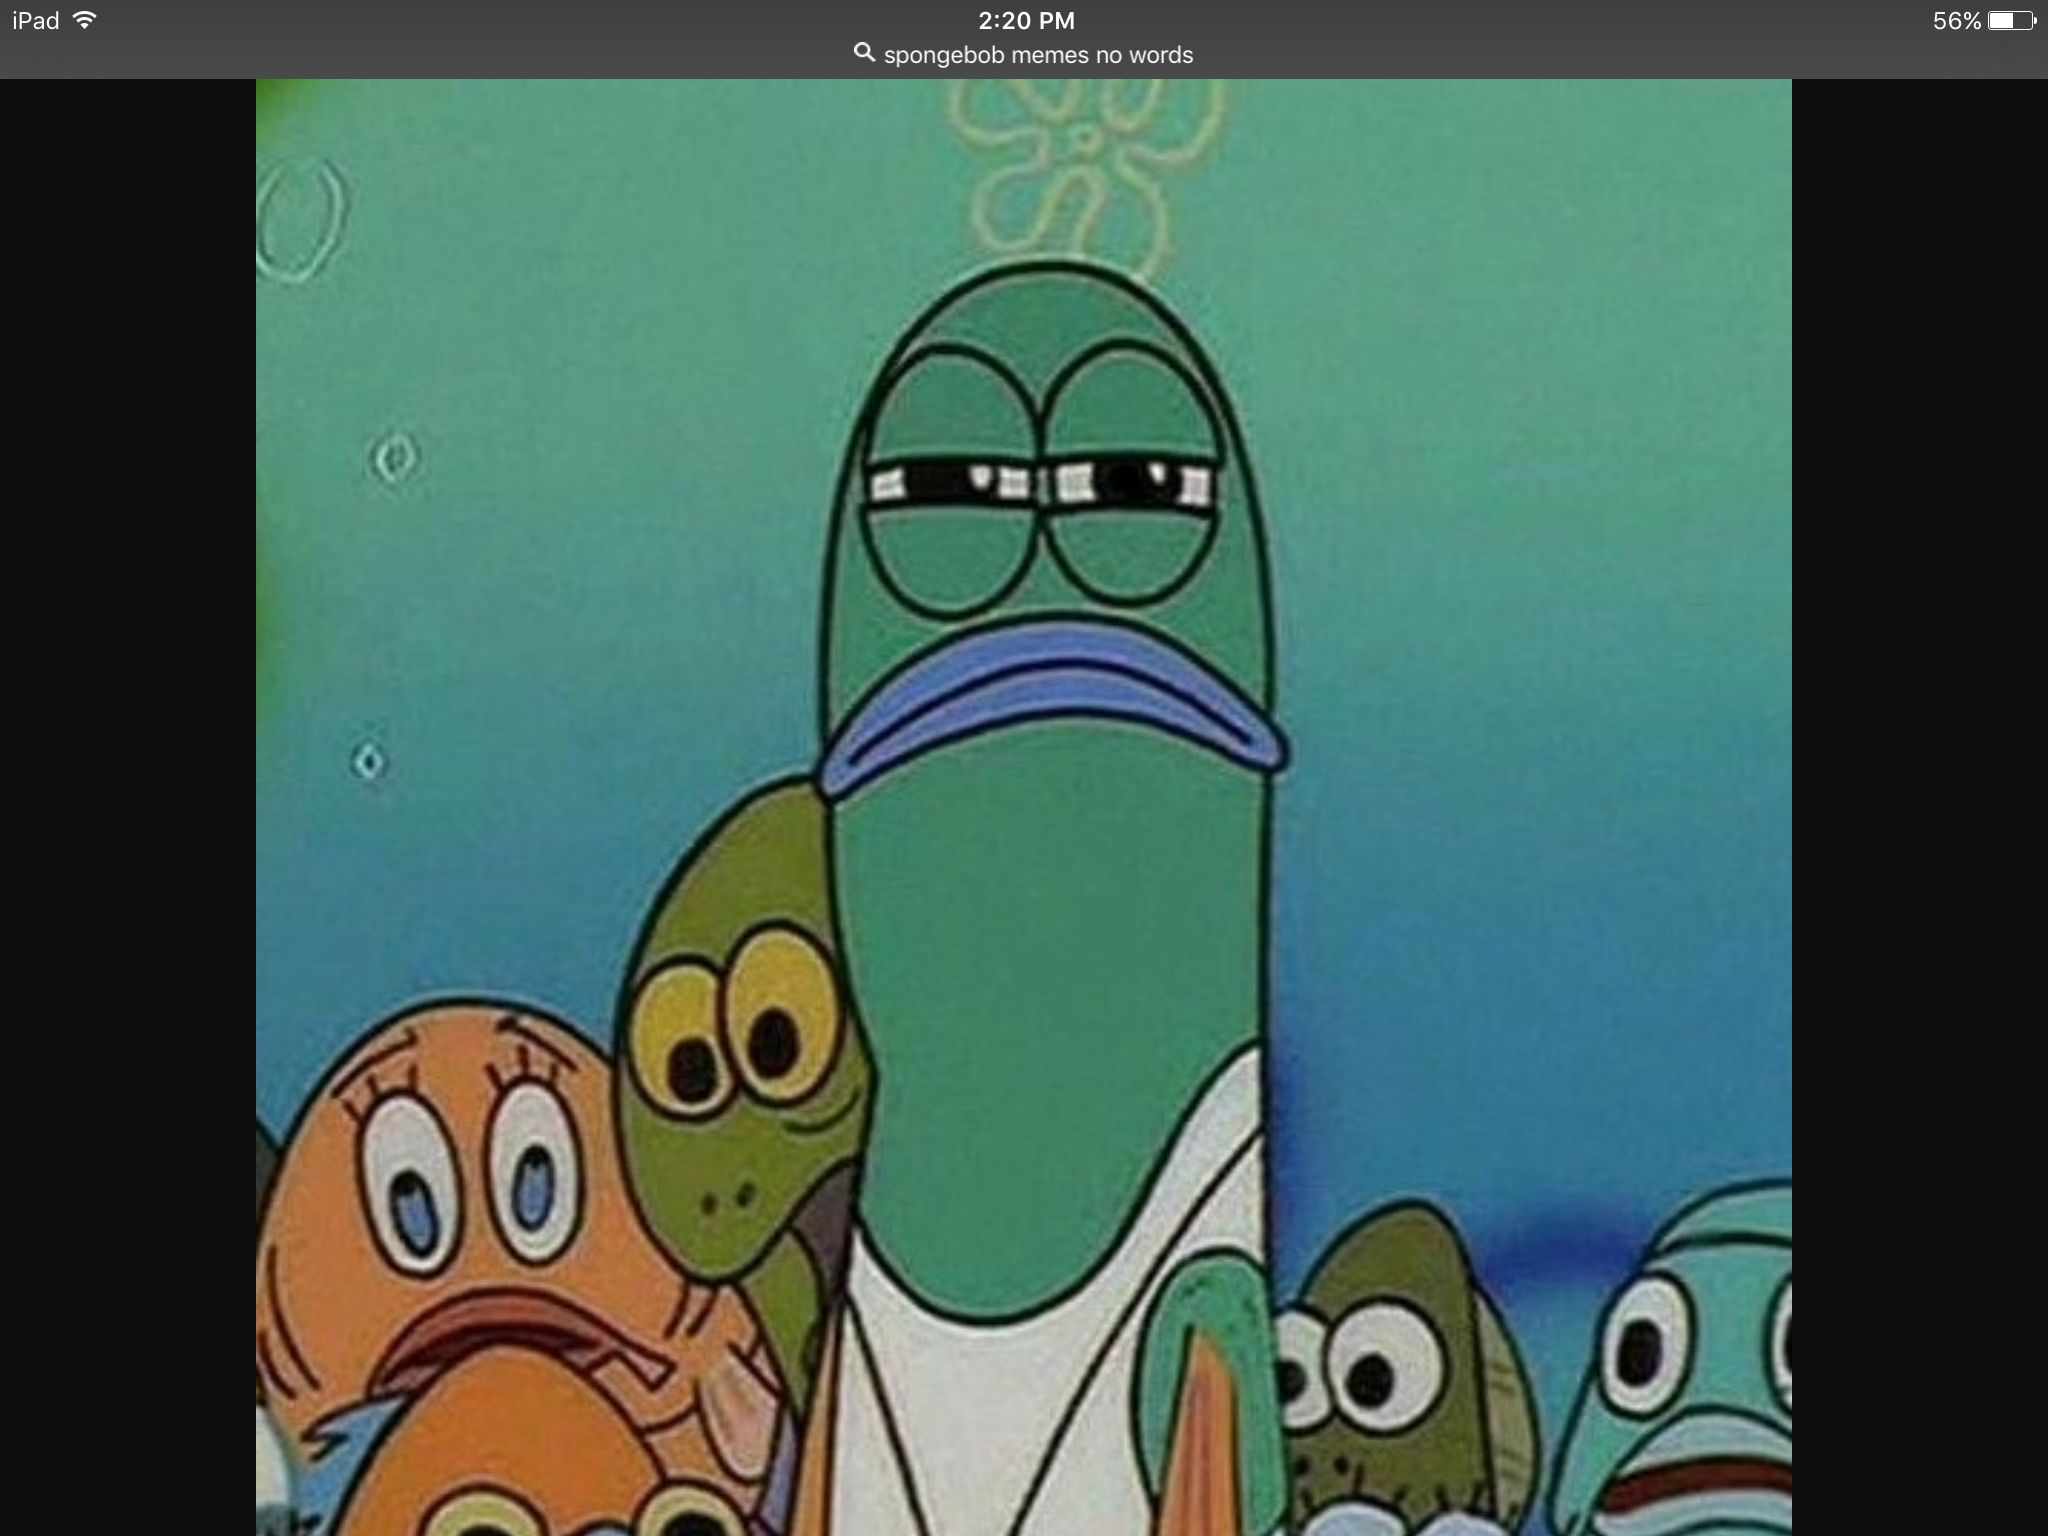 Spongebob meme blank www pixshark com images g eries